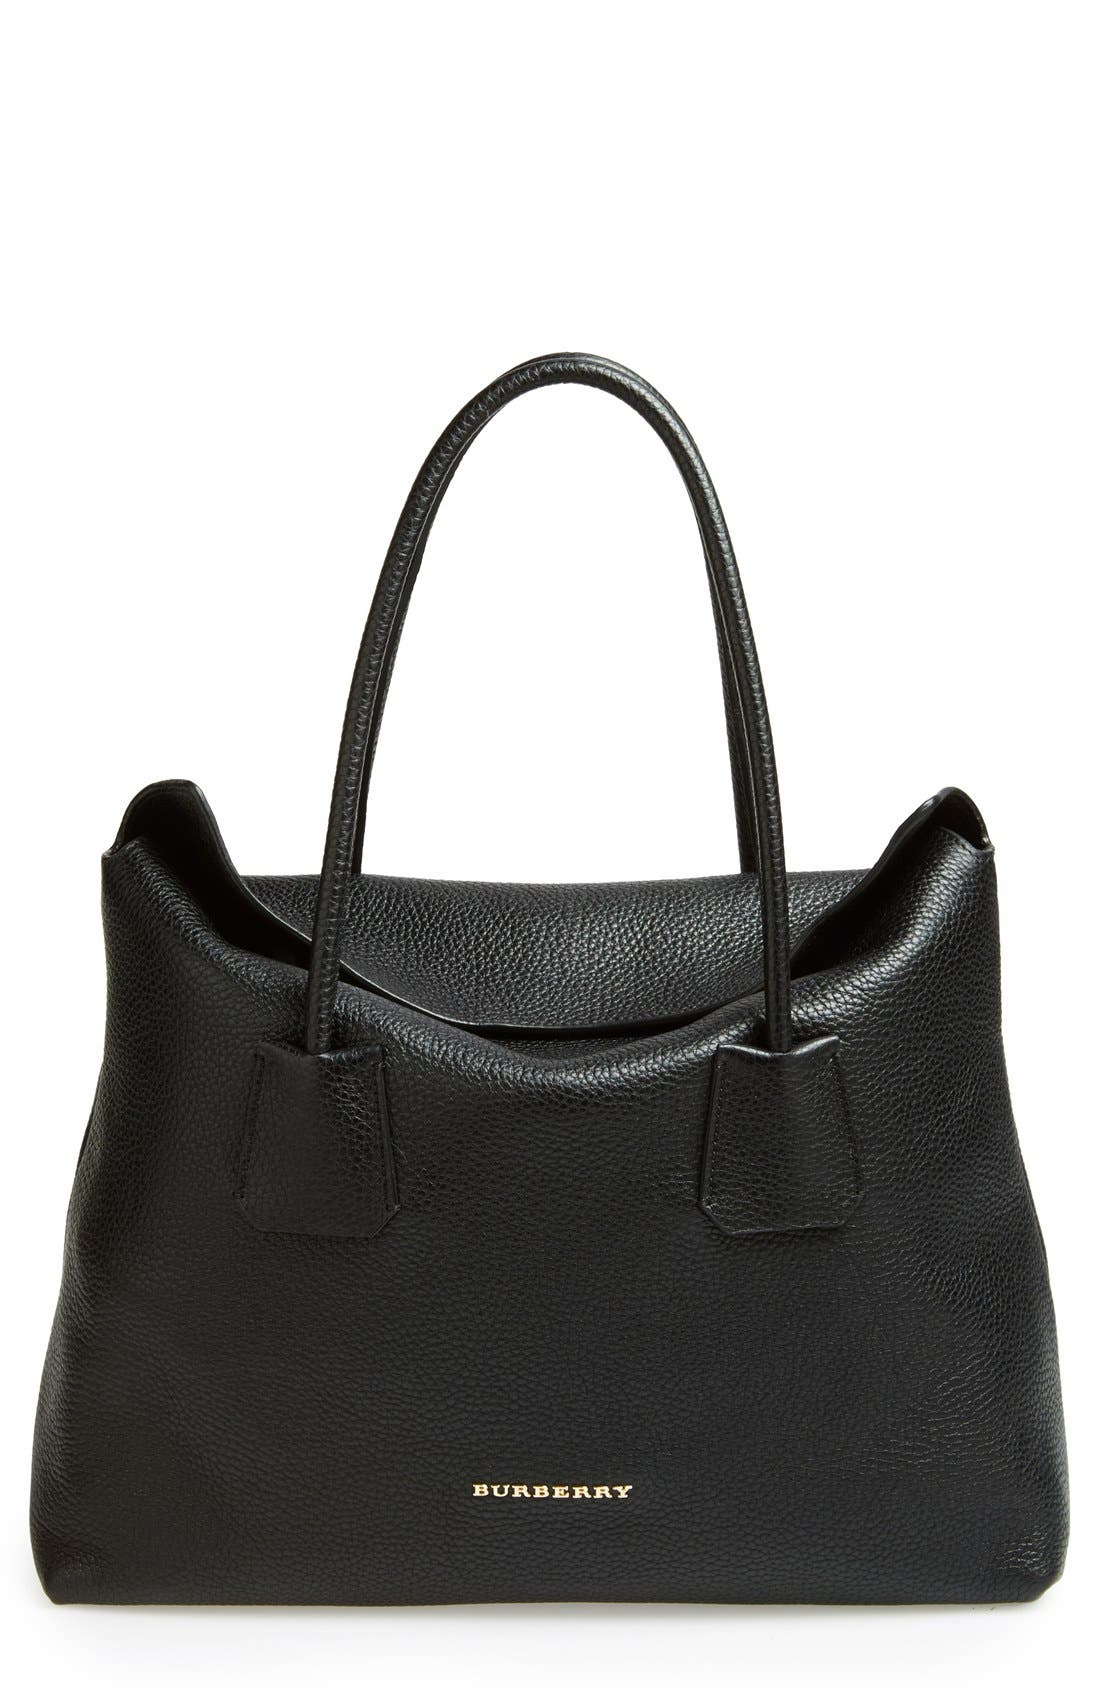 Main Image - Burberry 'Baynard' Leather Tote